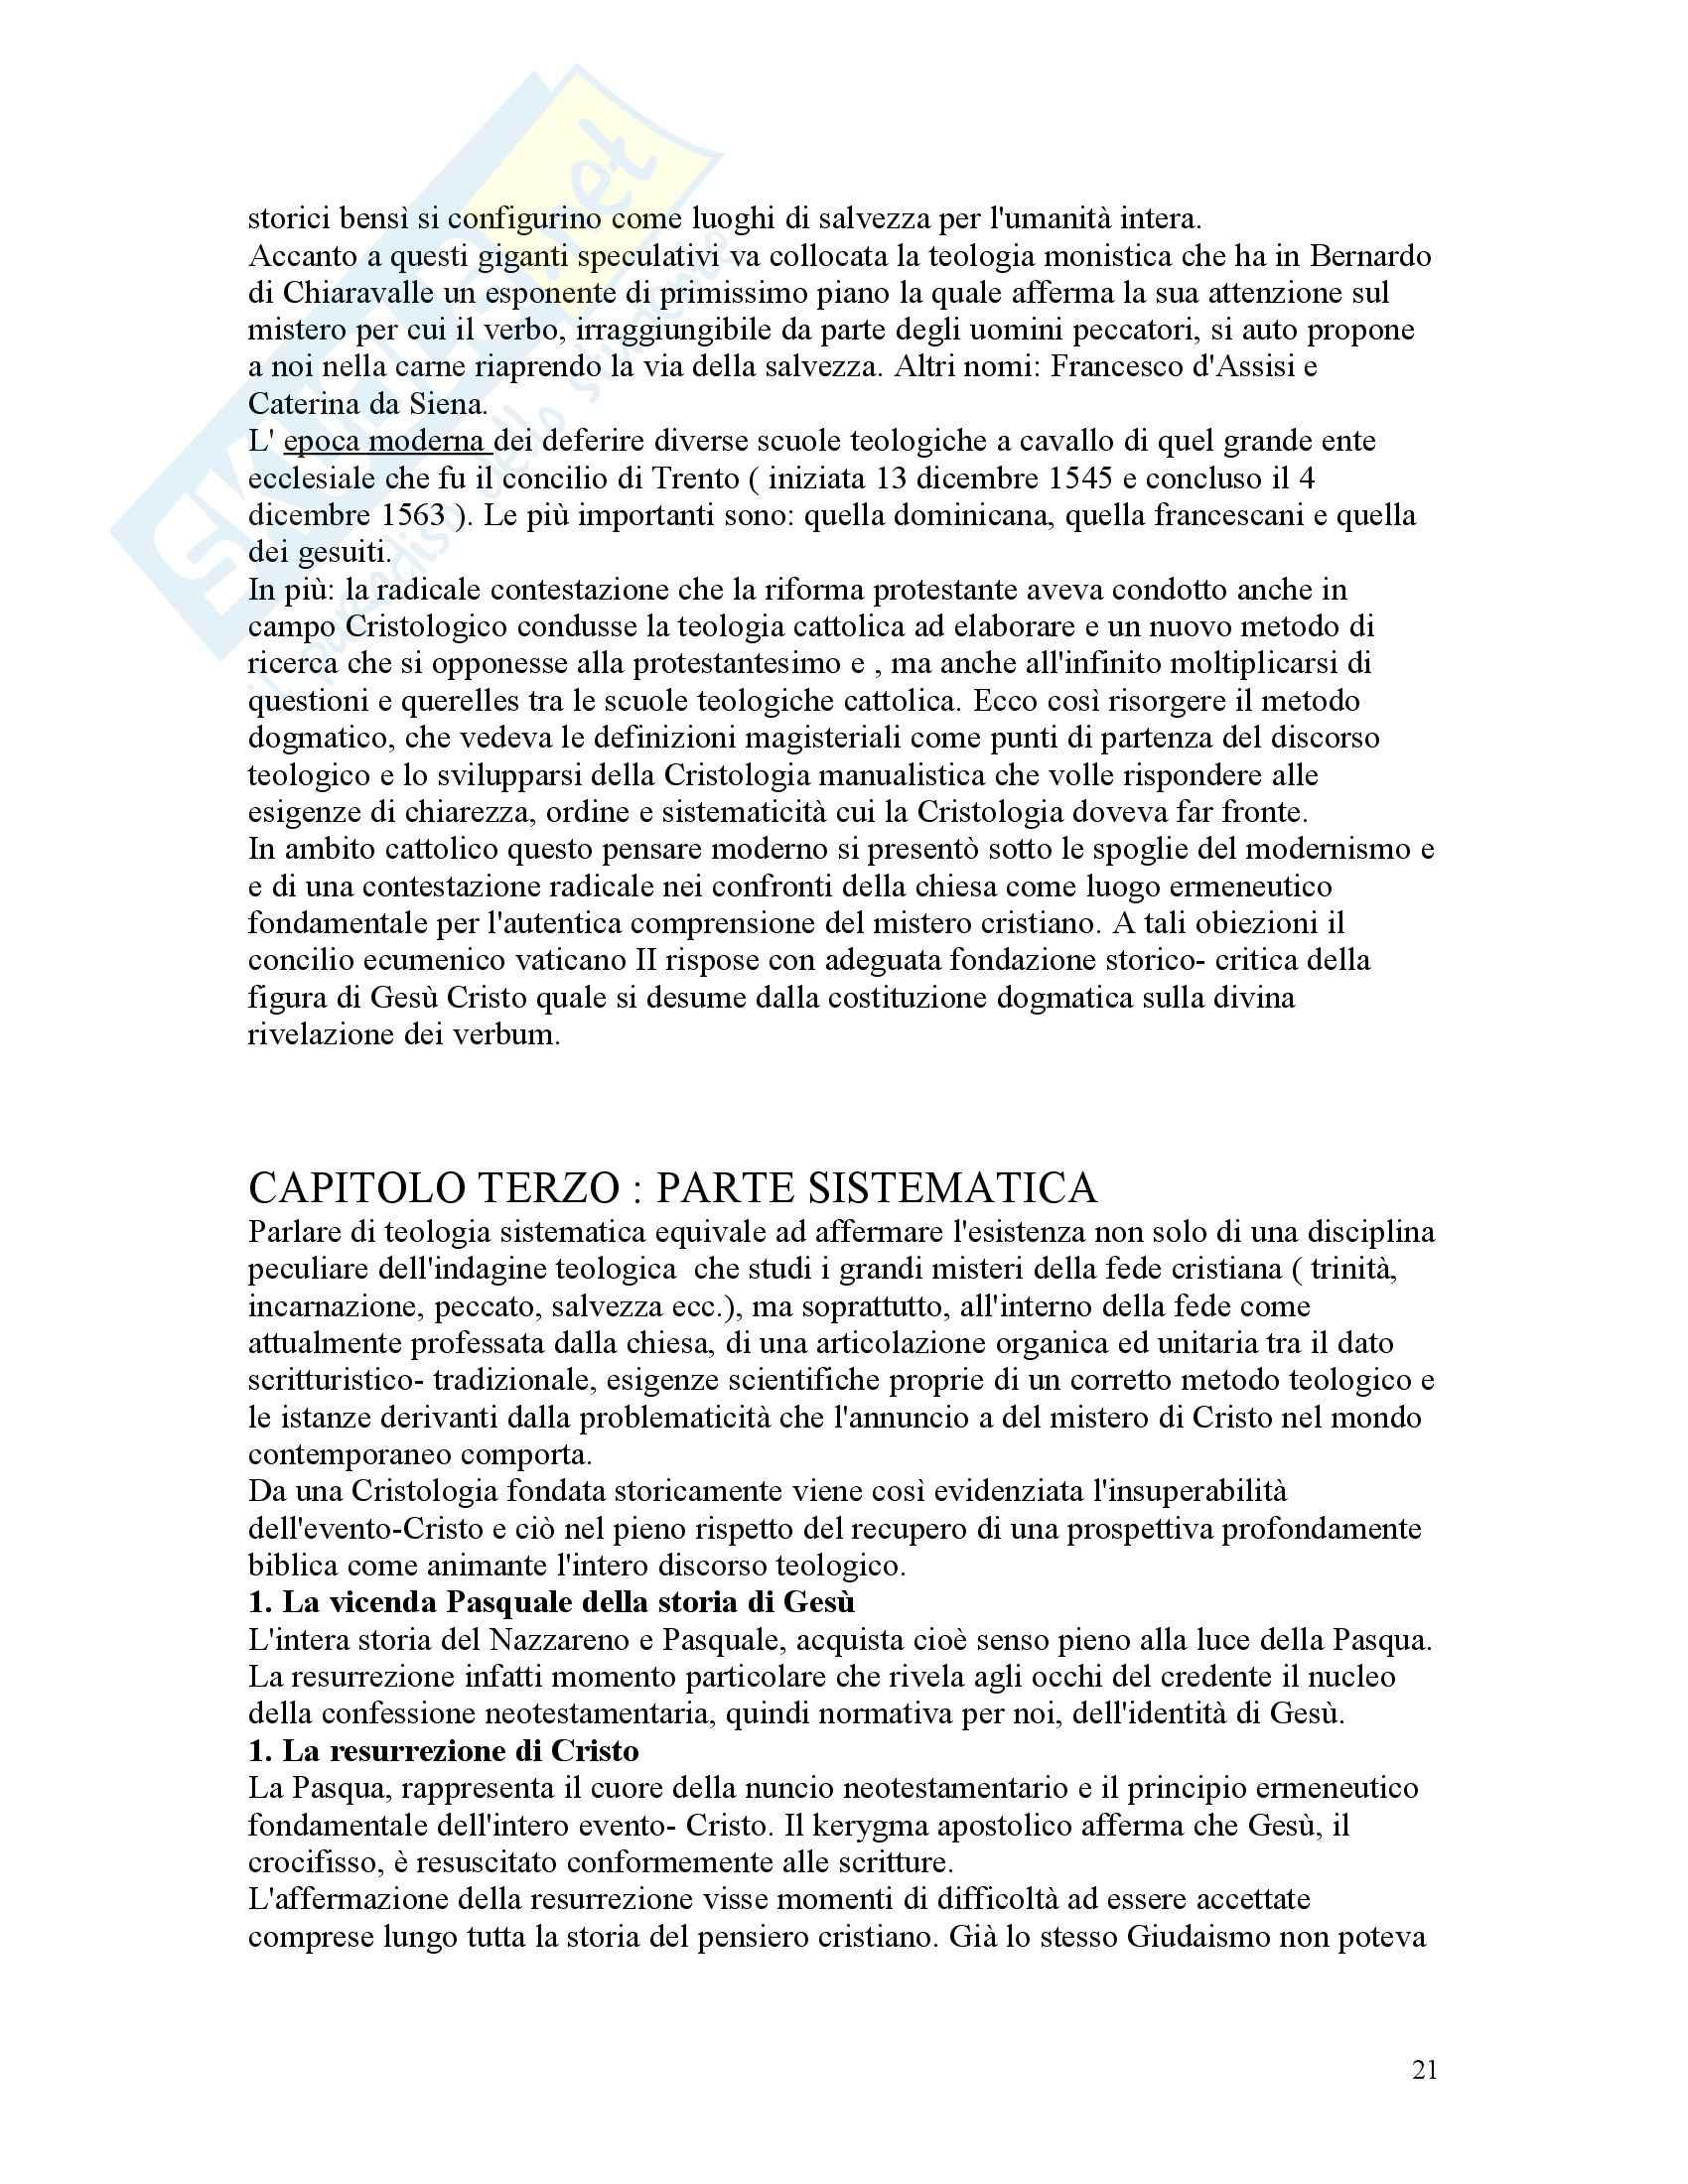 Teologia dogmatica - Appunti Pag. 21